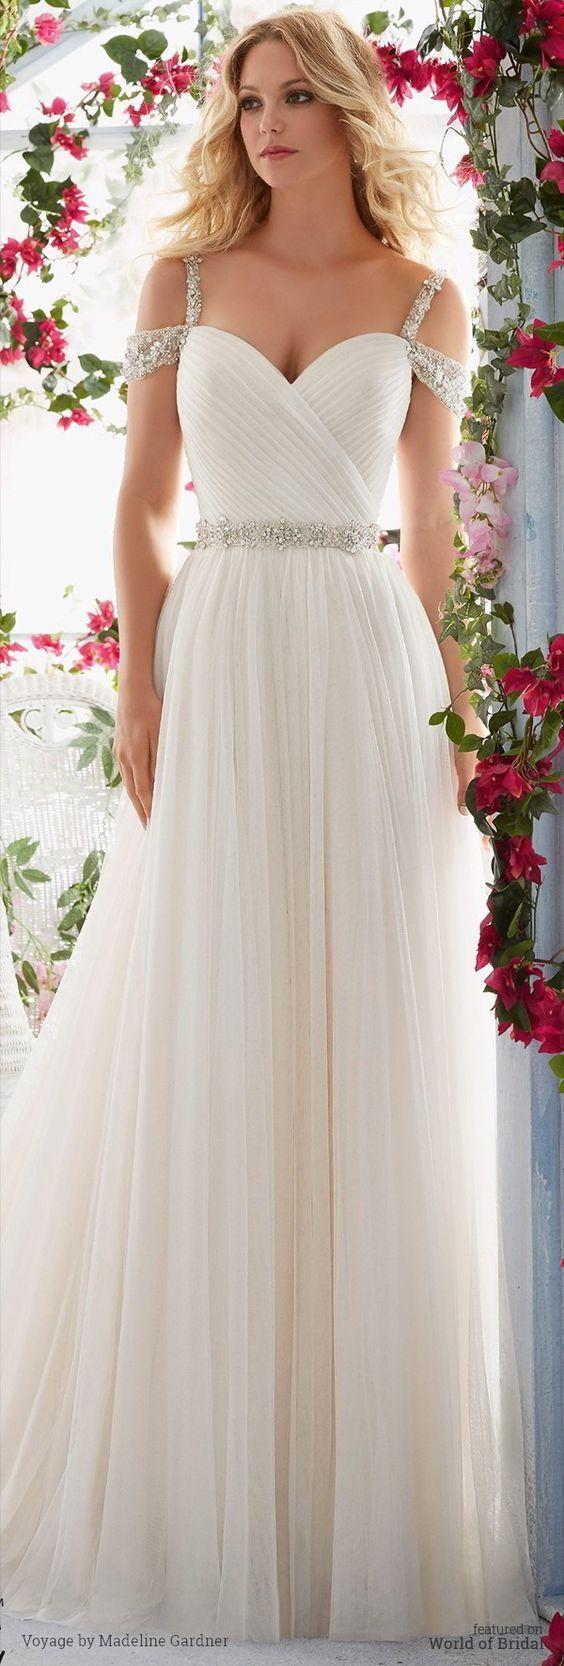 Crystal Beaded Embroidered Straps Wedding Dresses、 Deer